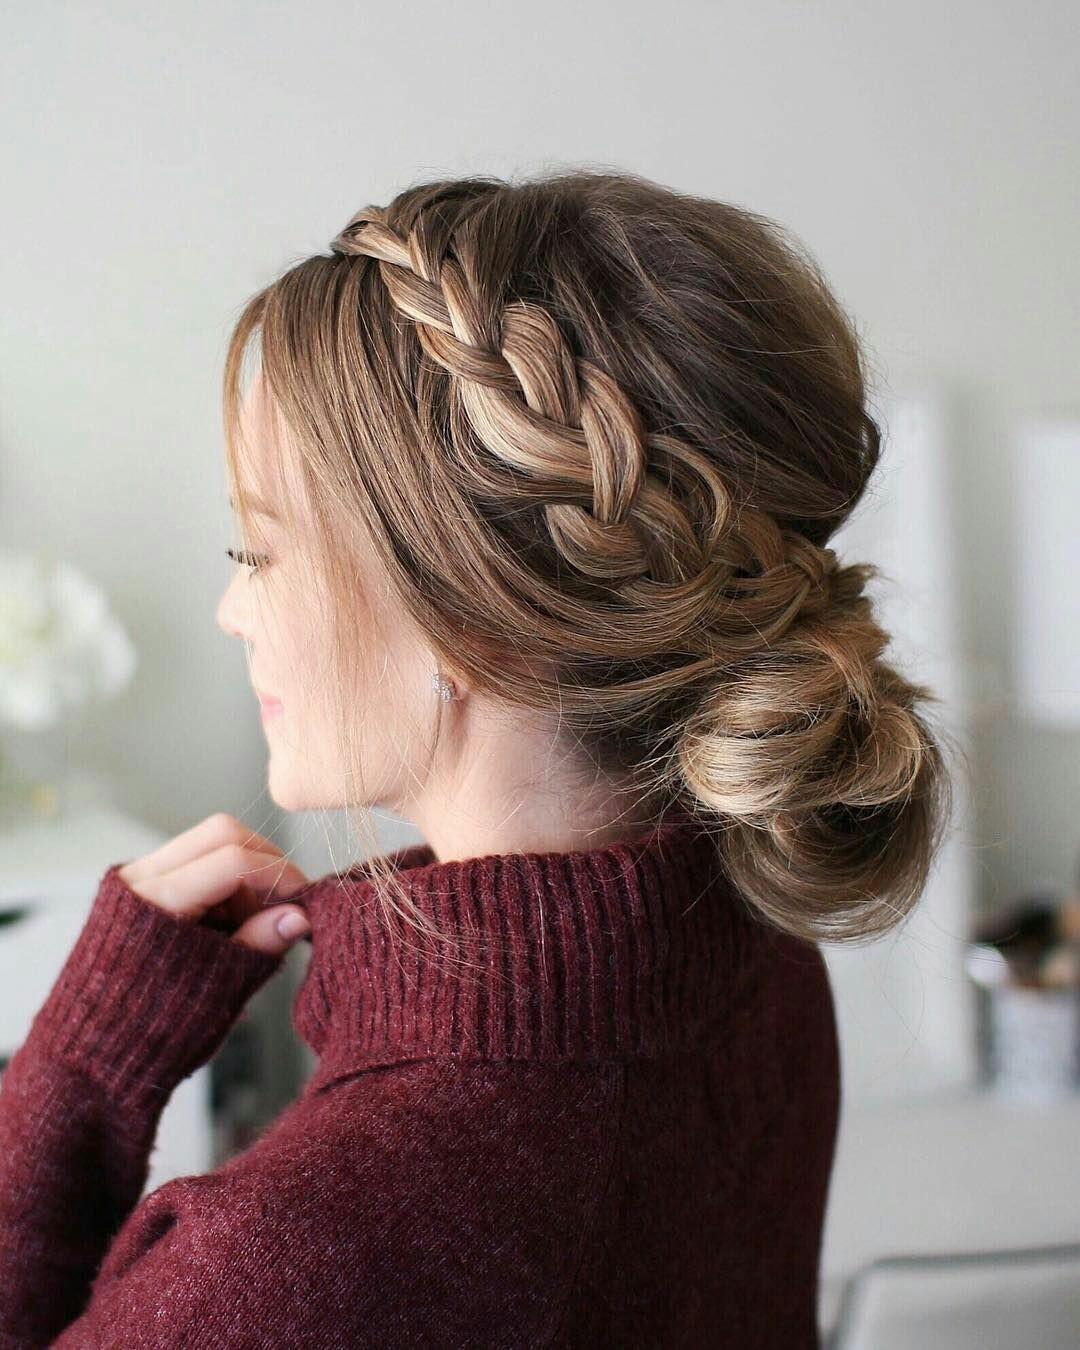 Hairstyle ،تجميعي💘🌼 bntpal.com_153856260